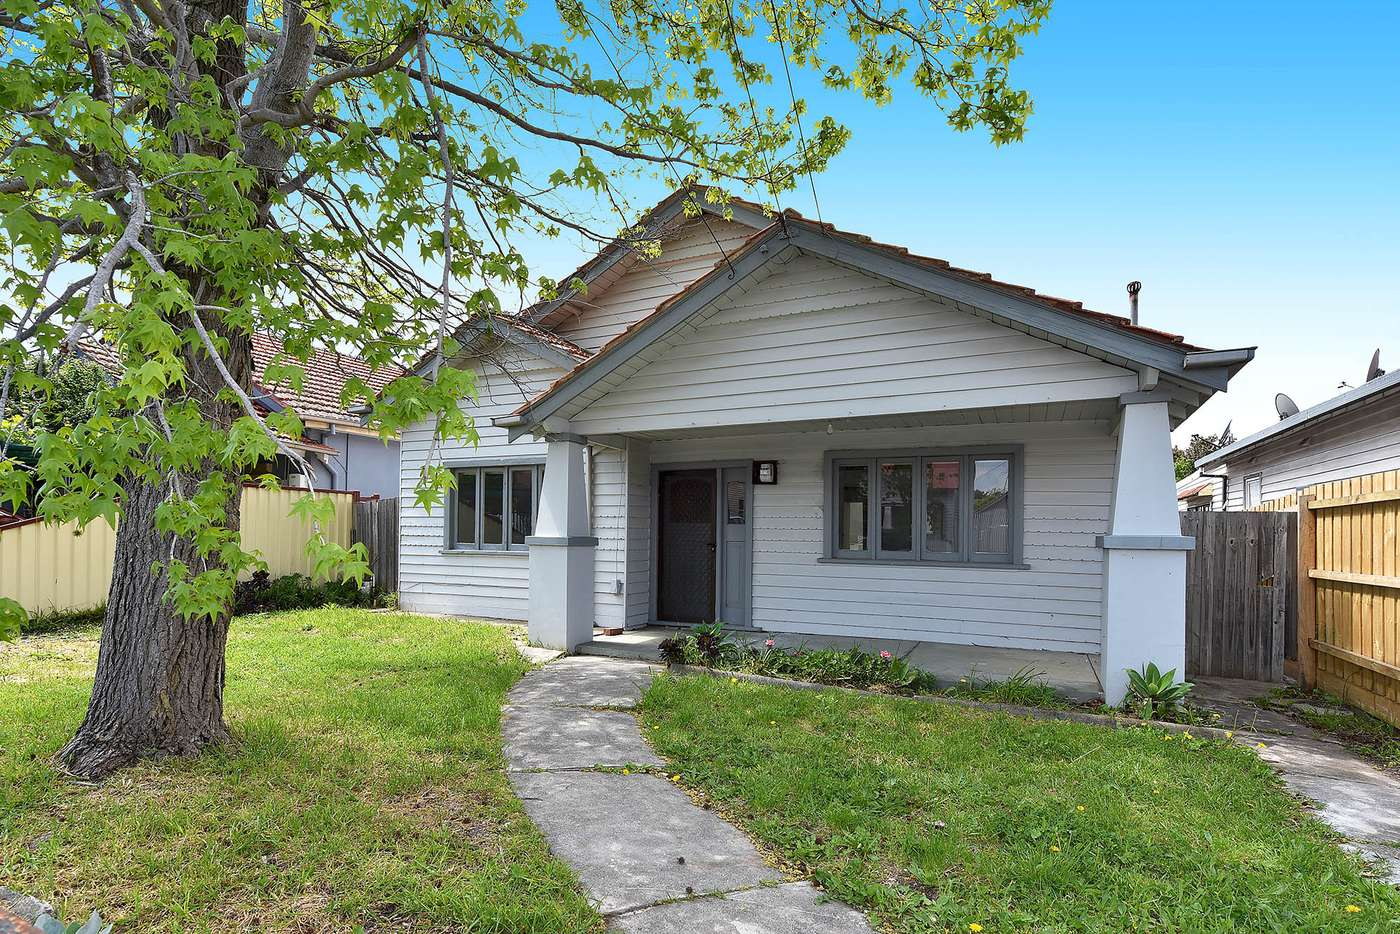 Main view of Homely house listing, 62 Darlington Grove, Coburg VIC 3058